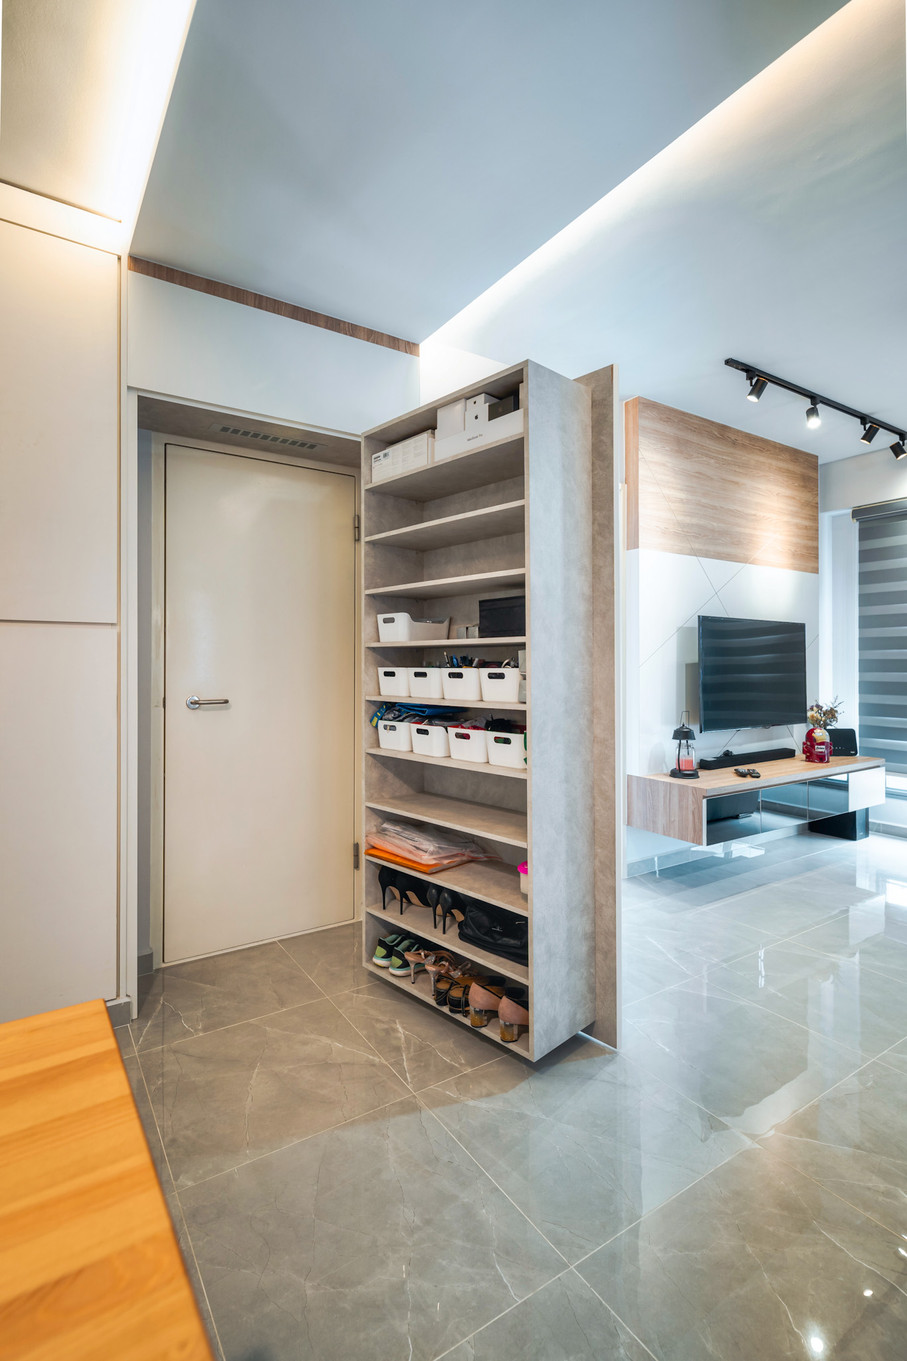 Strathmore Ave | Hidden shoe cabinet